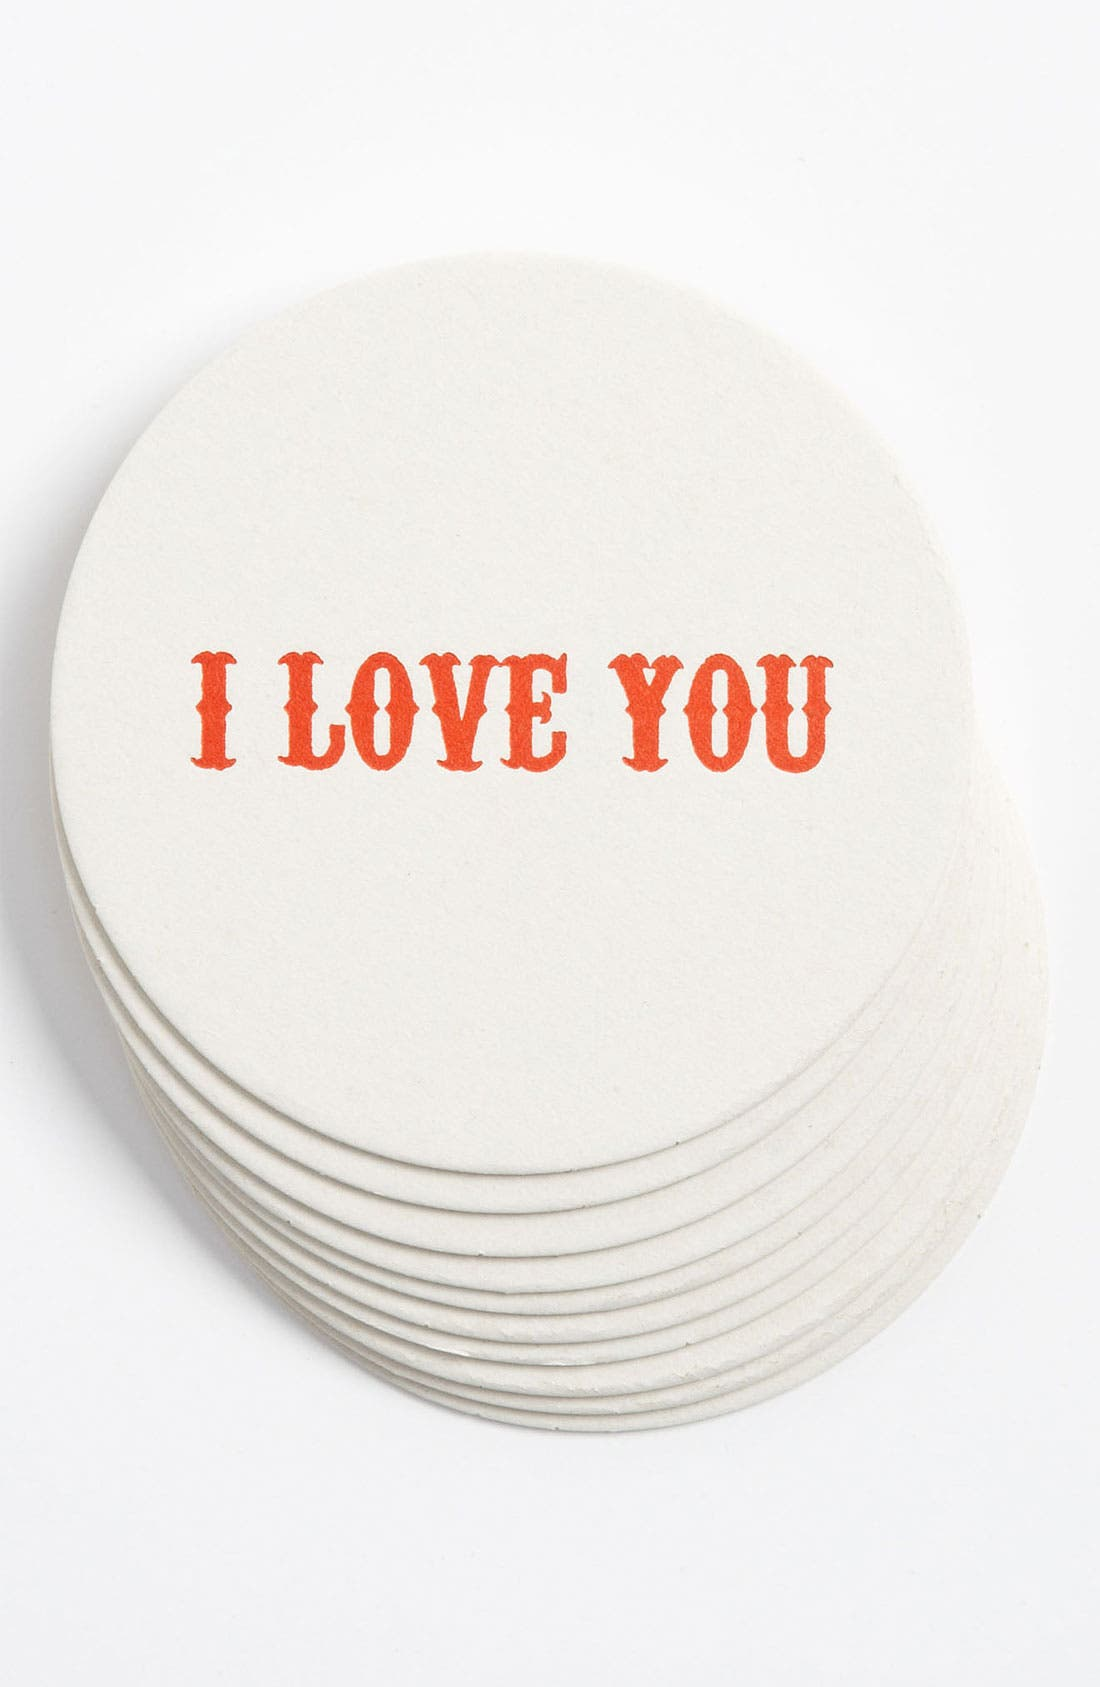 Main Image - 'I Love You' Letterpress Coasters (Set of 10)